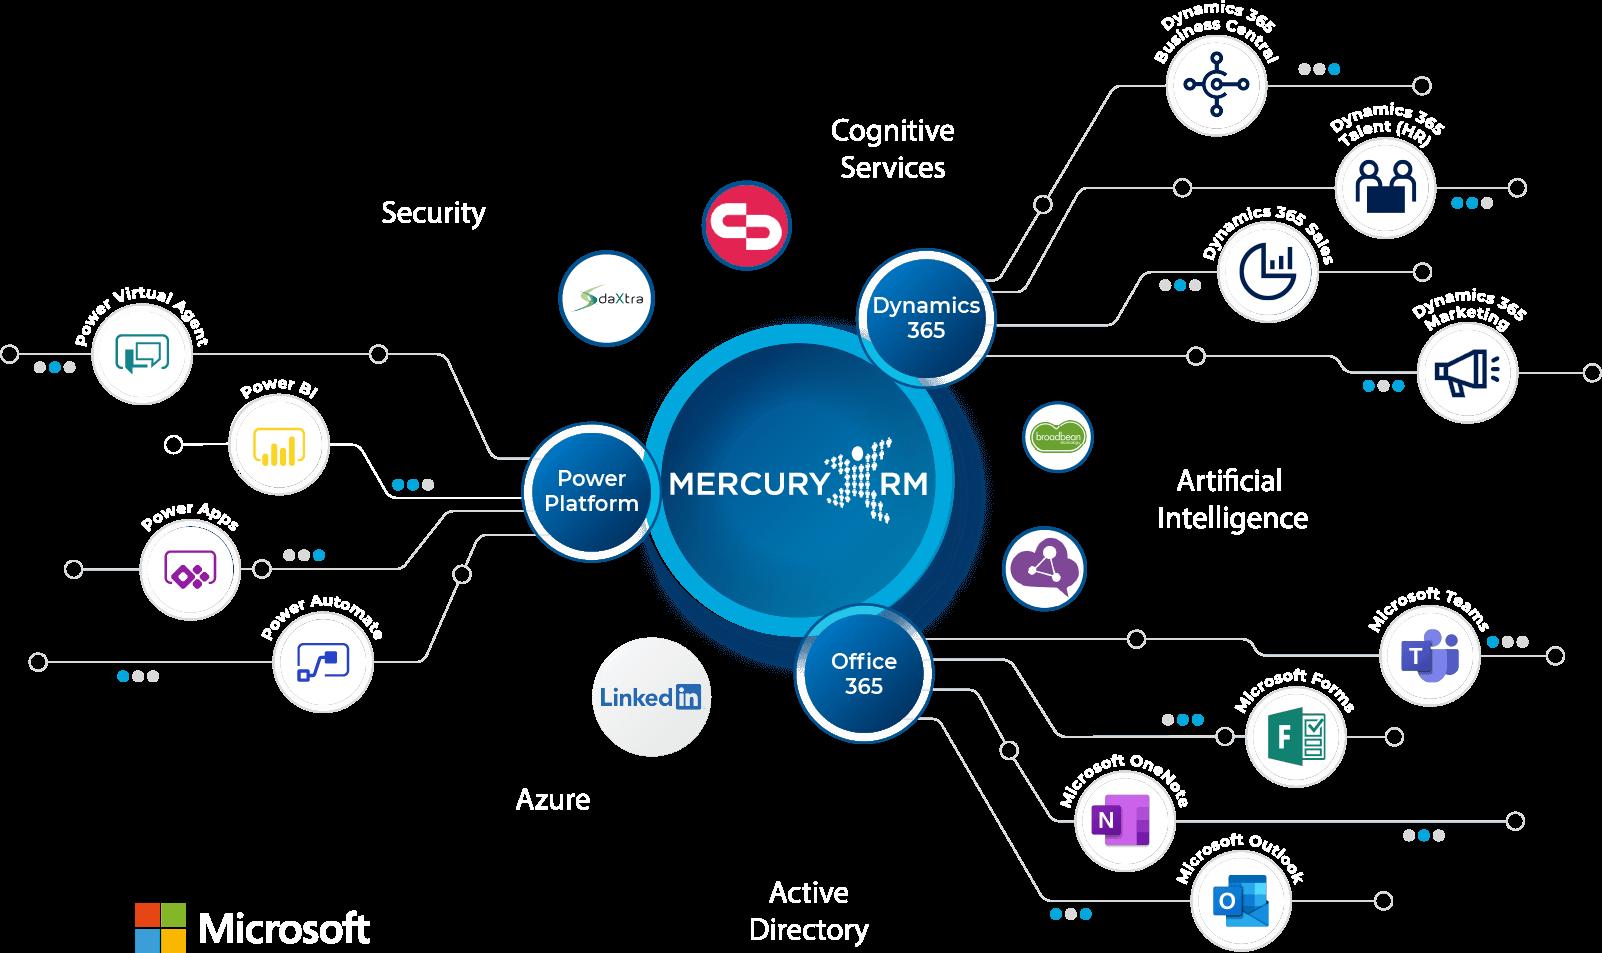 Merucry xRM Power Platform Illustration